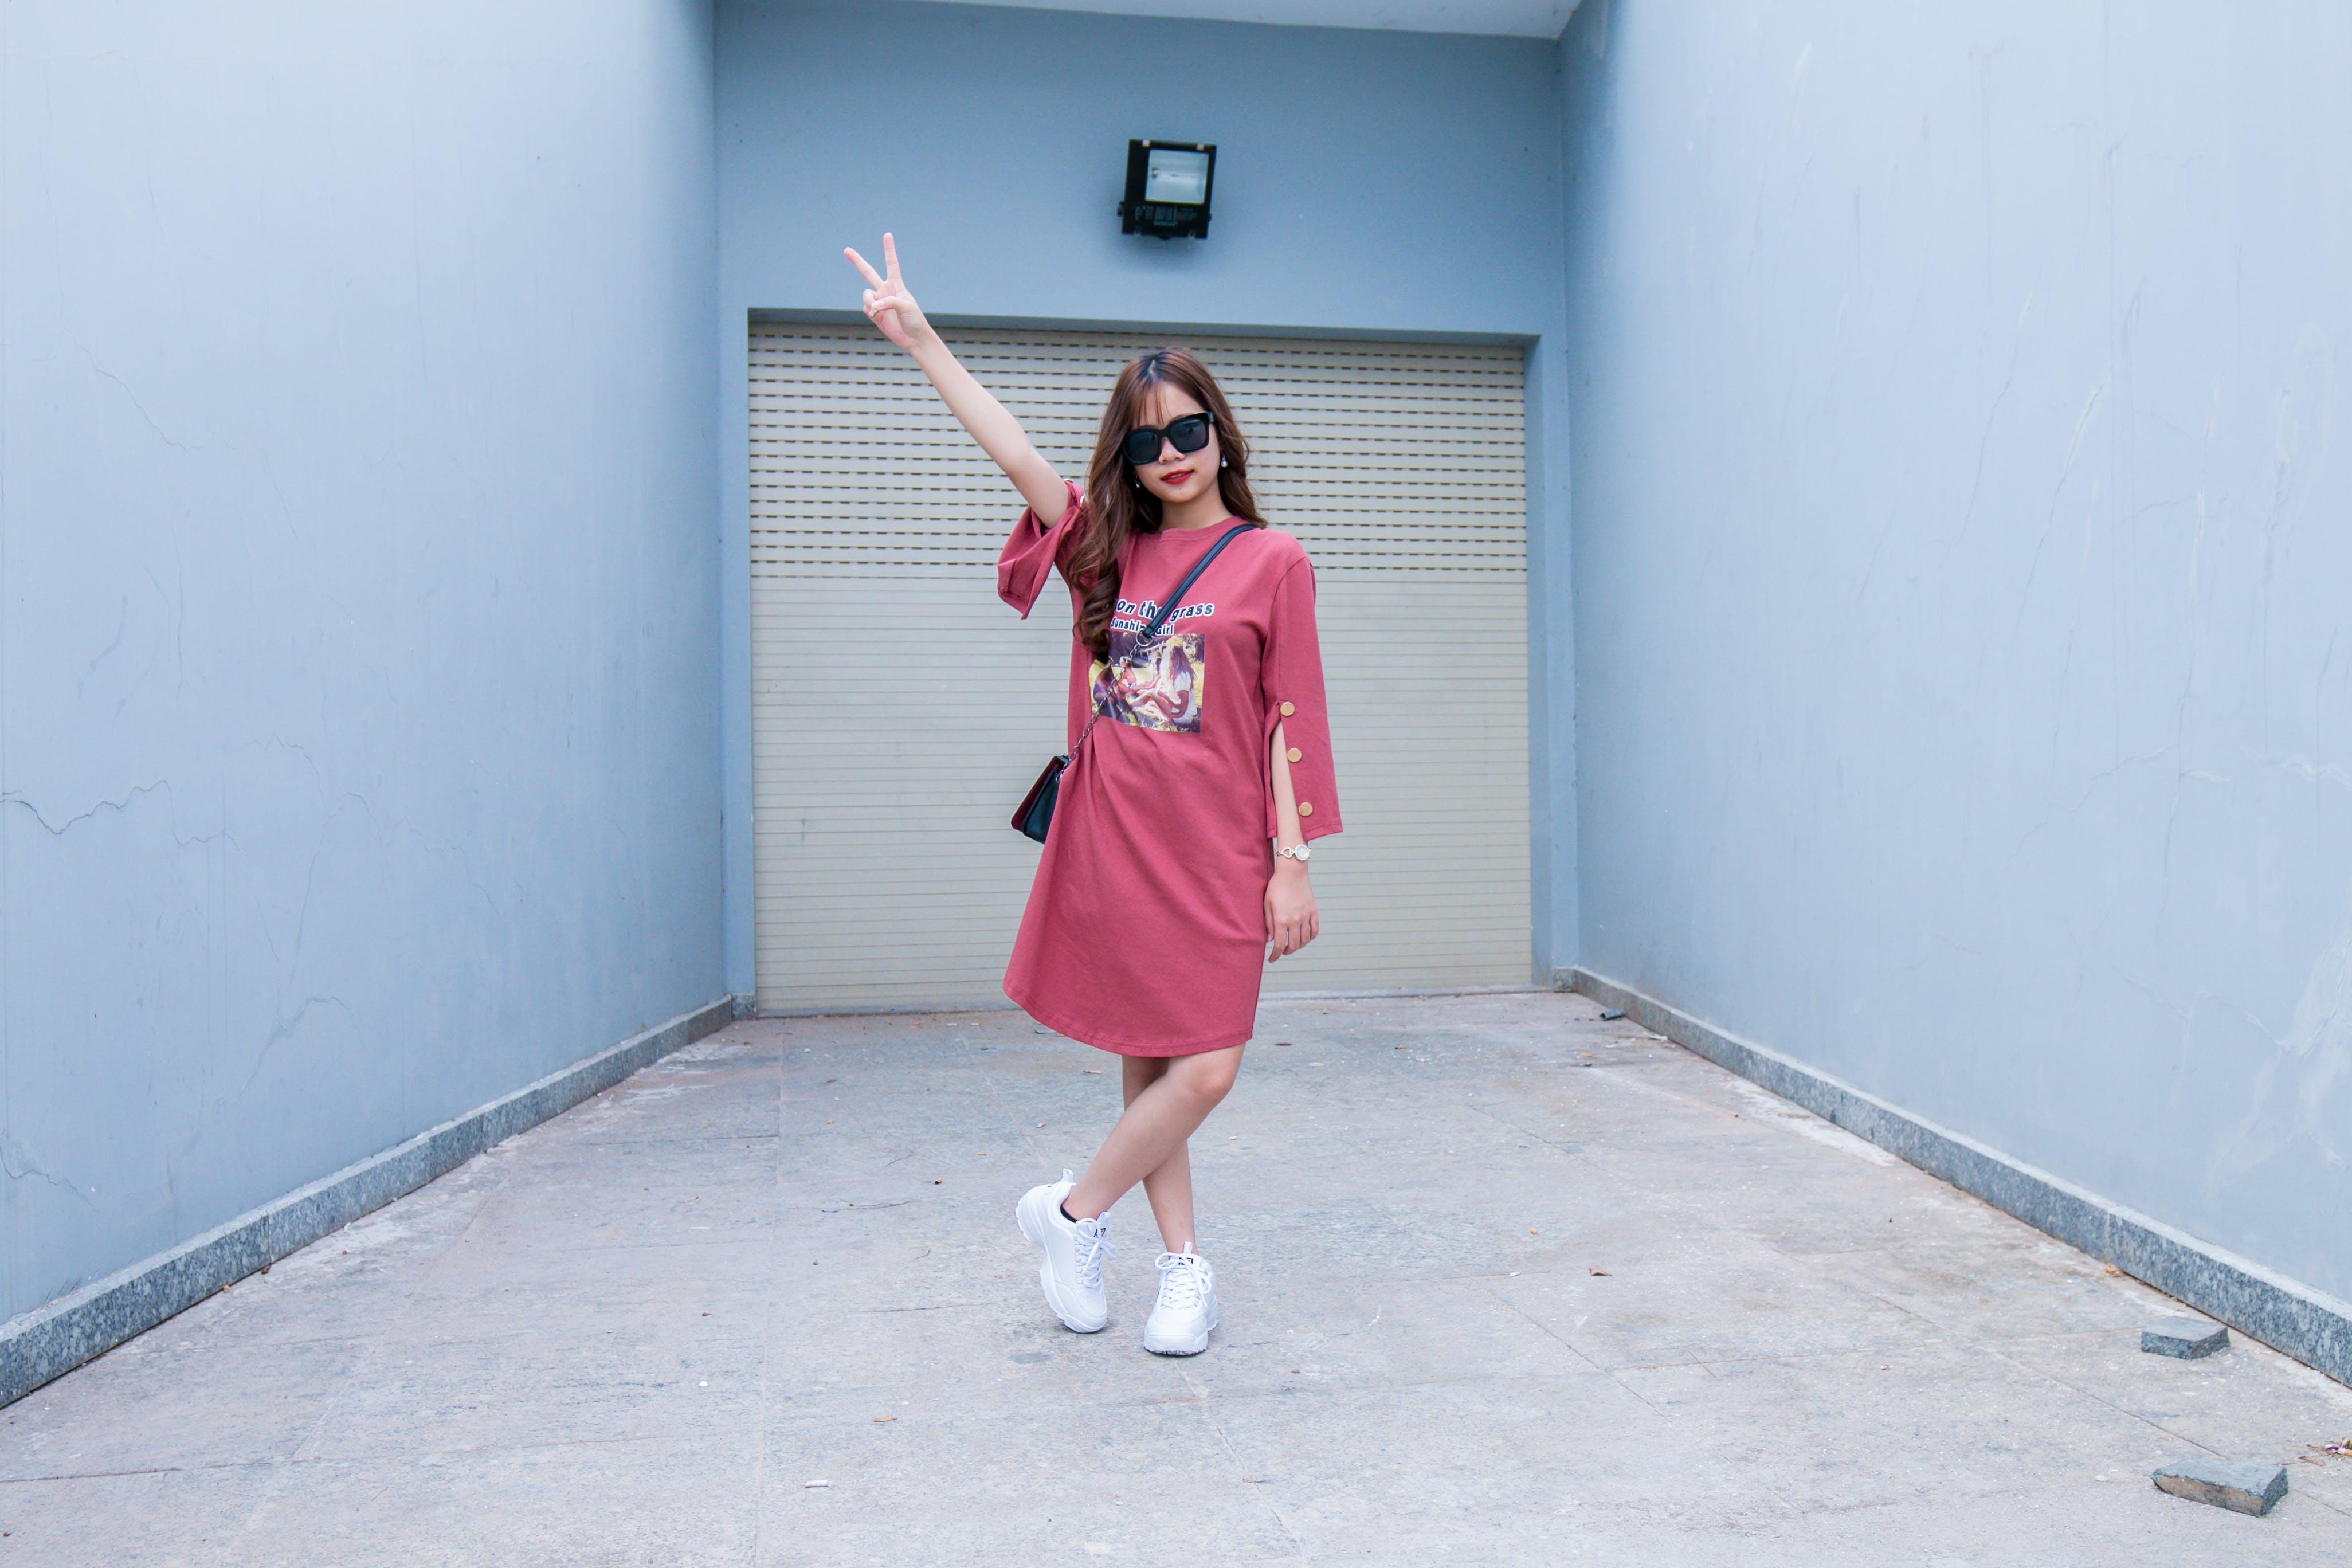 Woman Wearing Red Long-sleeved Dress Standing in Front of Shutter Door